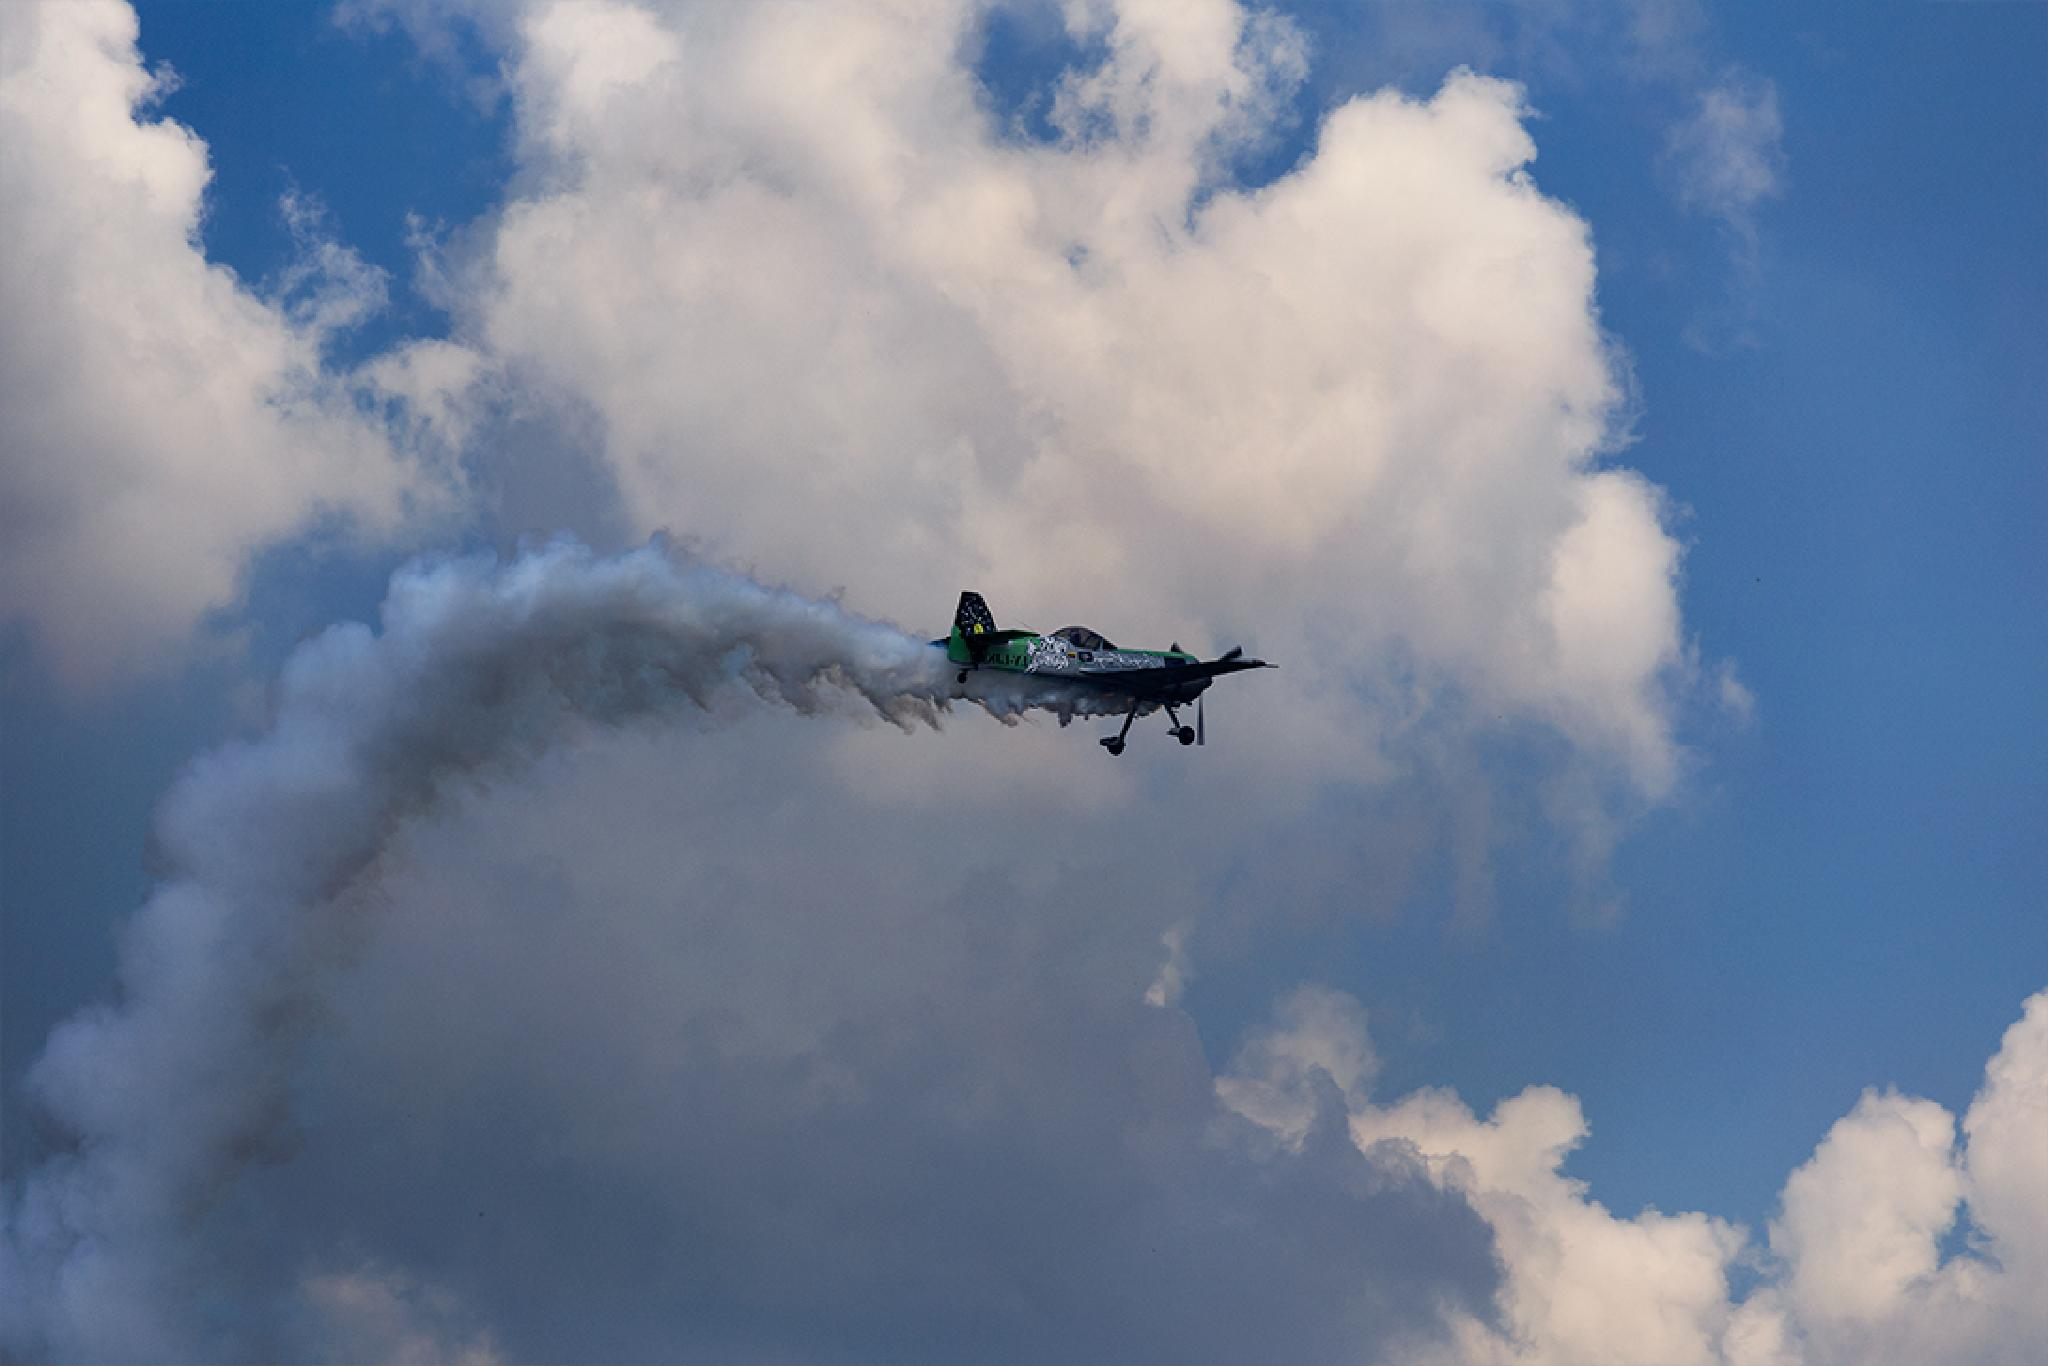 Acrobatics in the sky by Mirela Savu